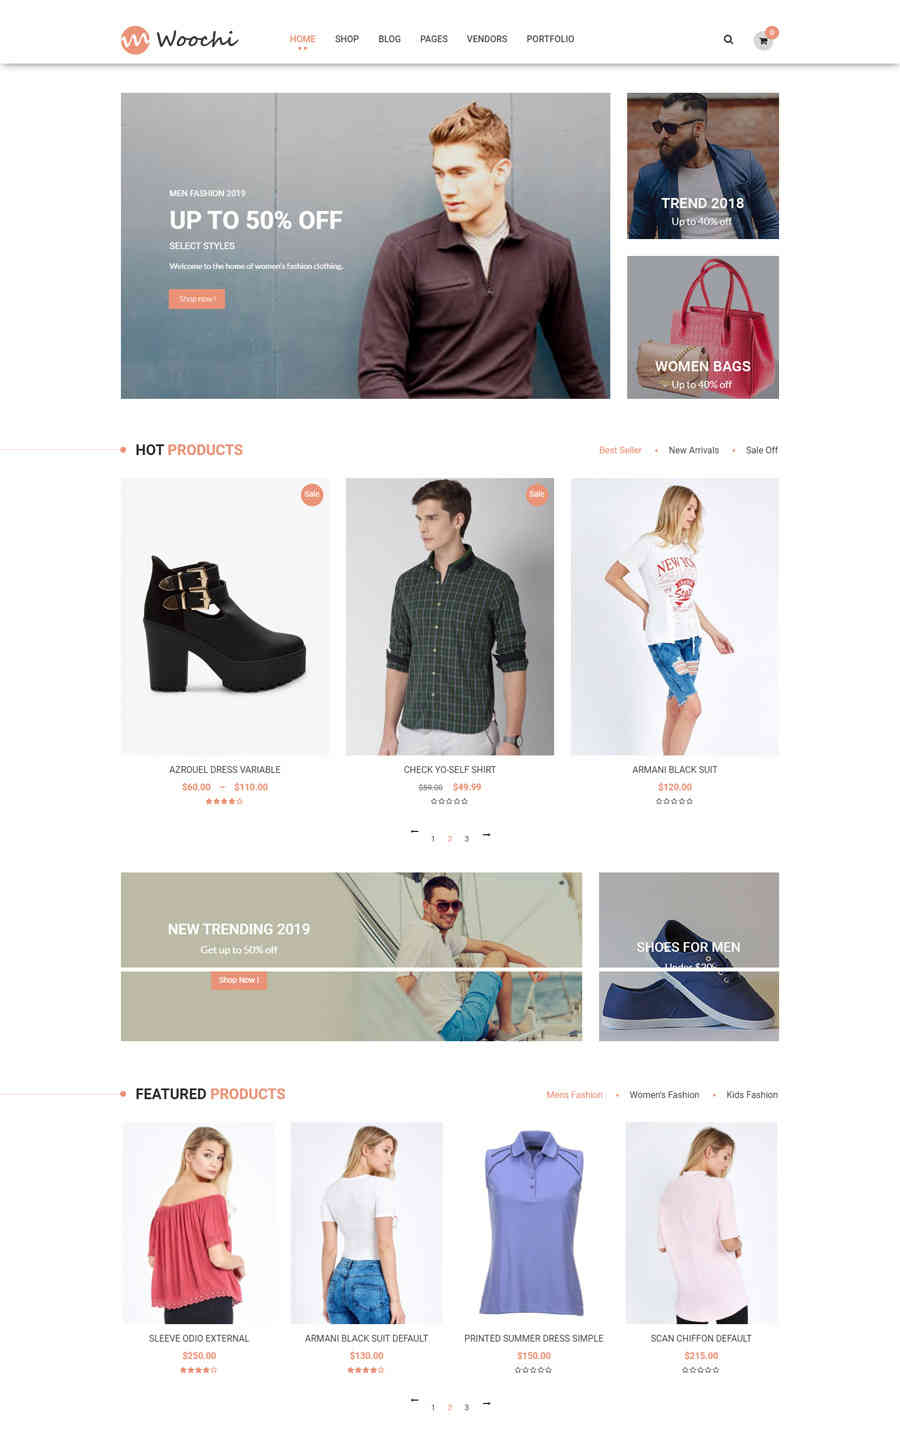 Giao diện web thời trang woochi